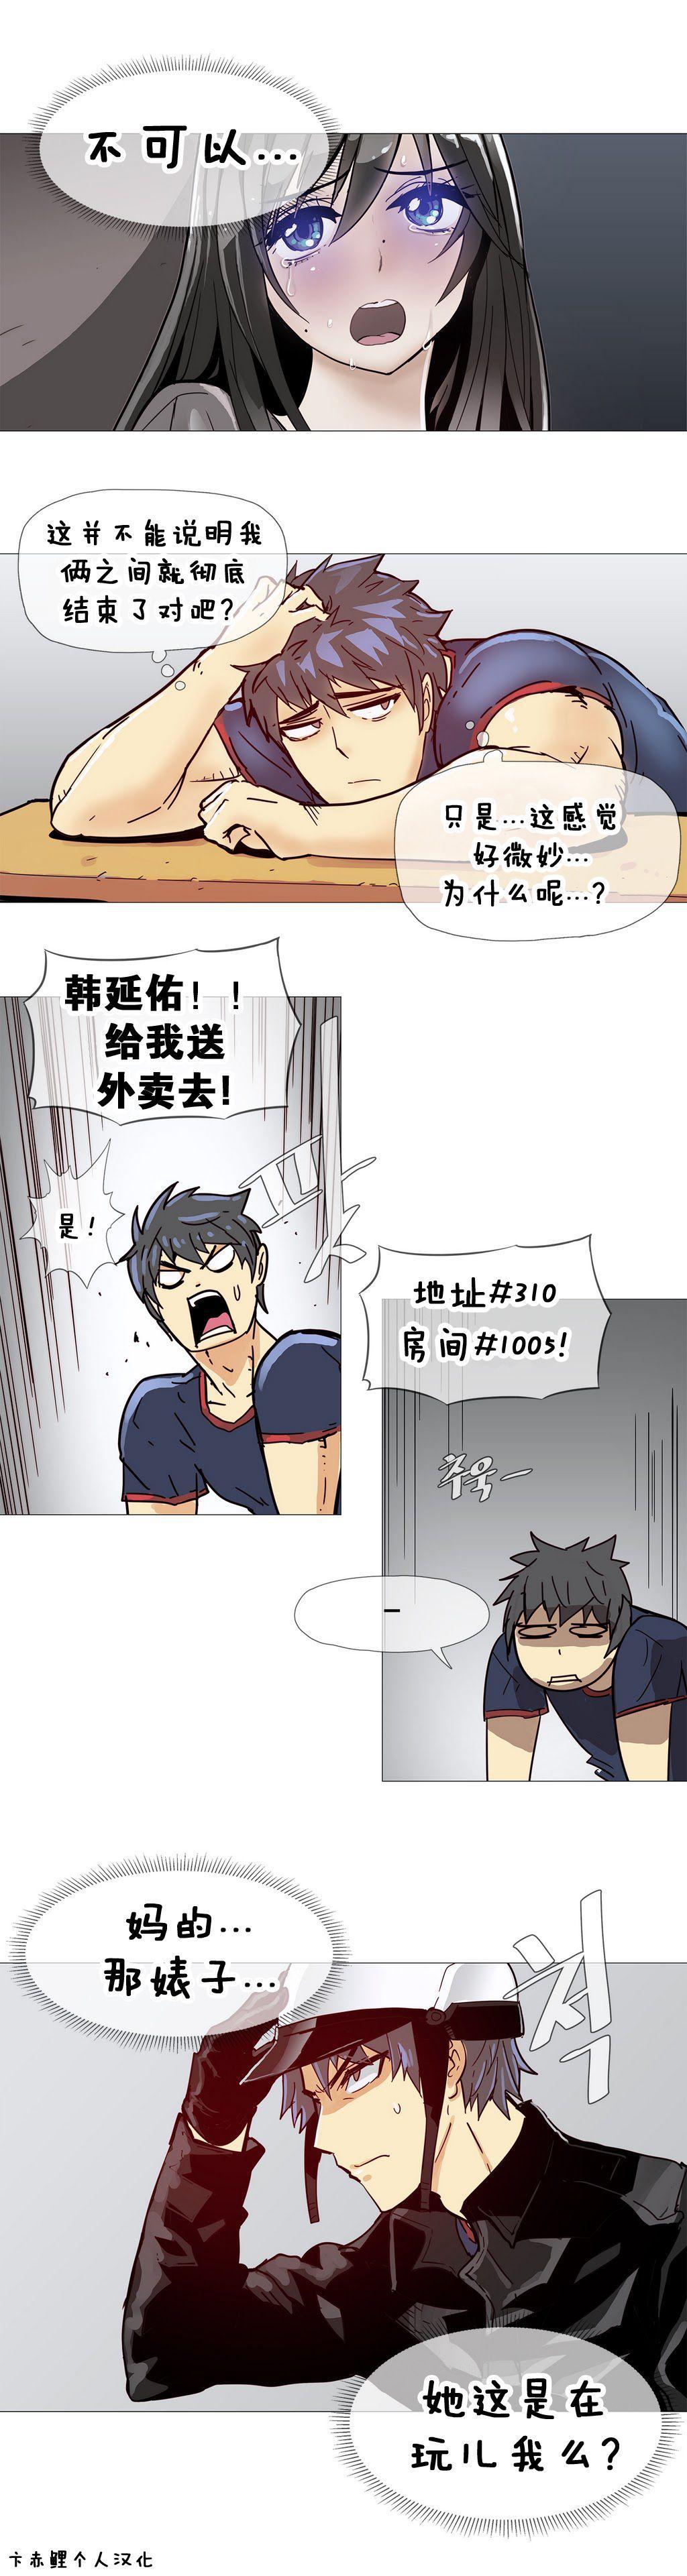 HouseHold Affairs 【卞赤鲤个人汉化】1~21话(持续更新中) 237